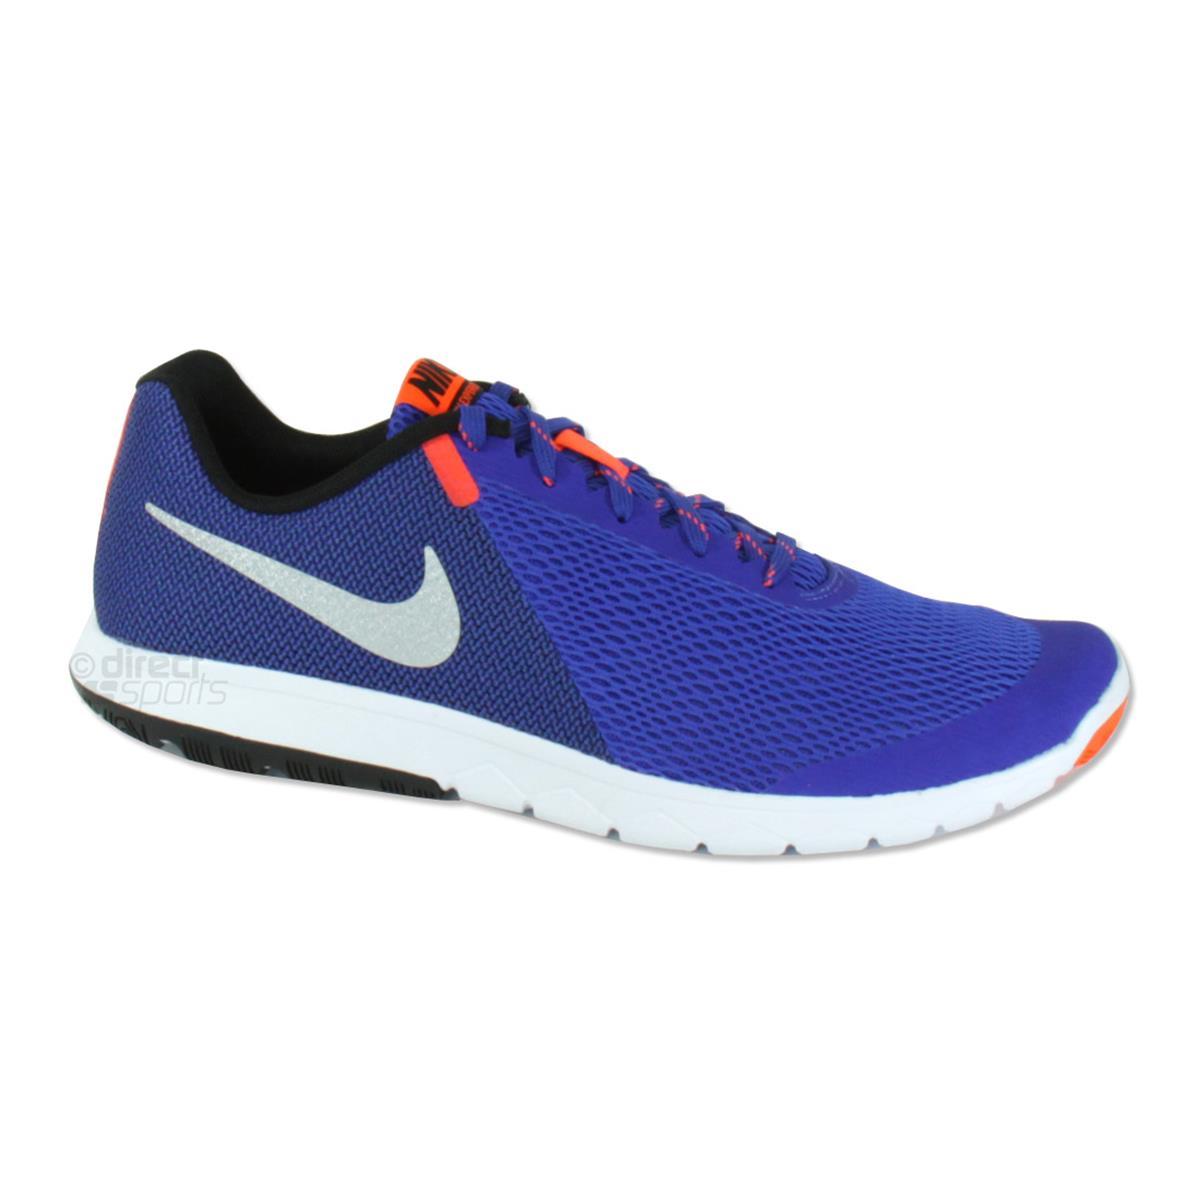 4b7609e85663 Nike Flex Experience RN 5 Mens Running Shoes (Racer Blue ...